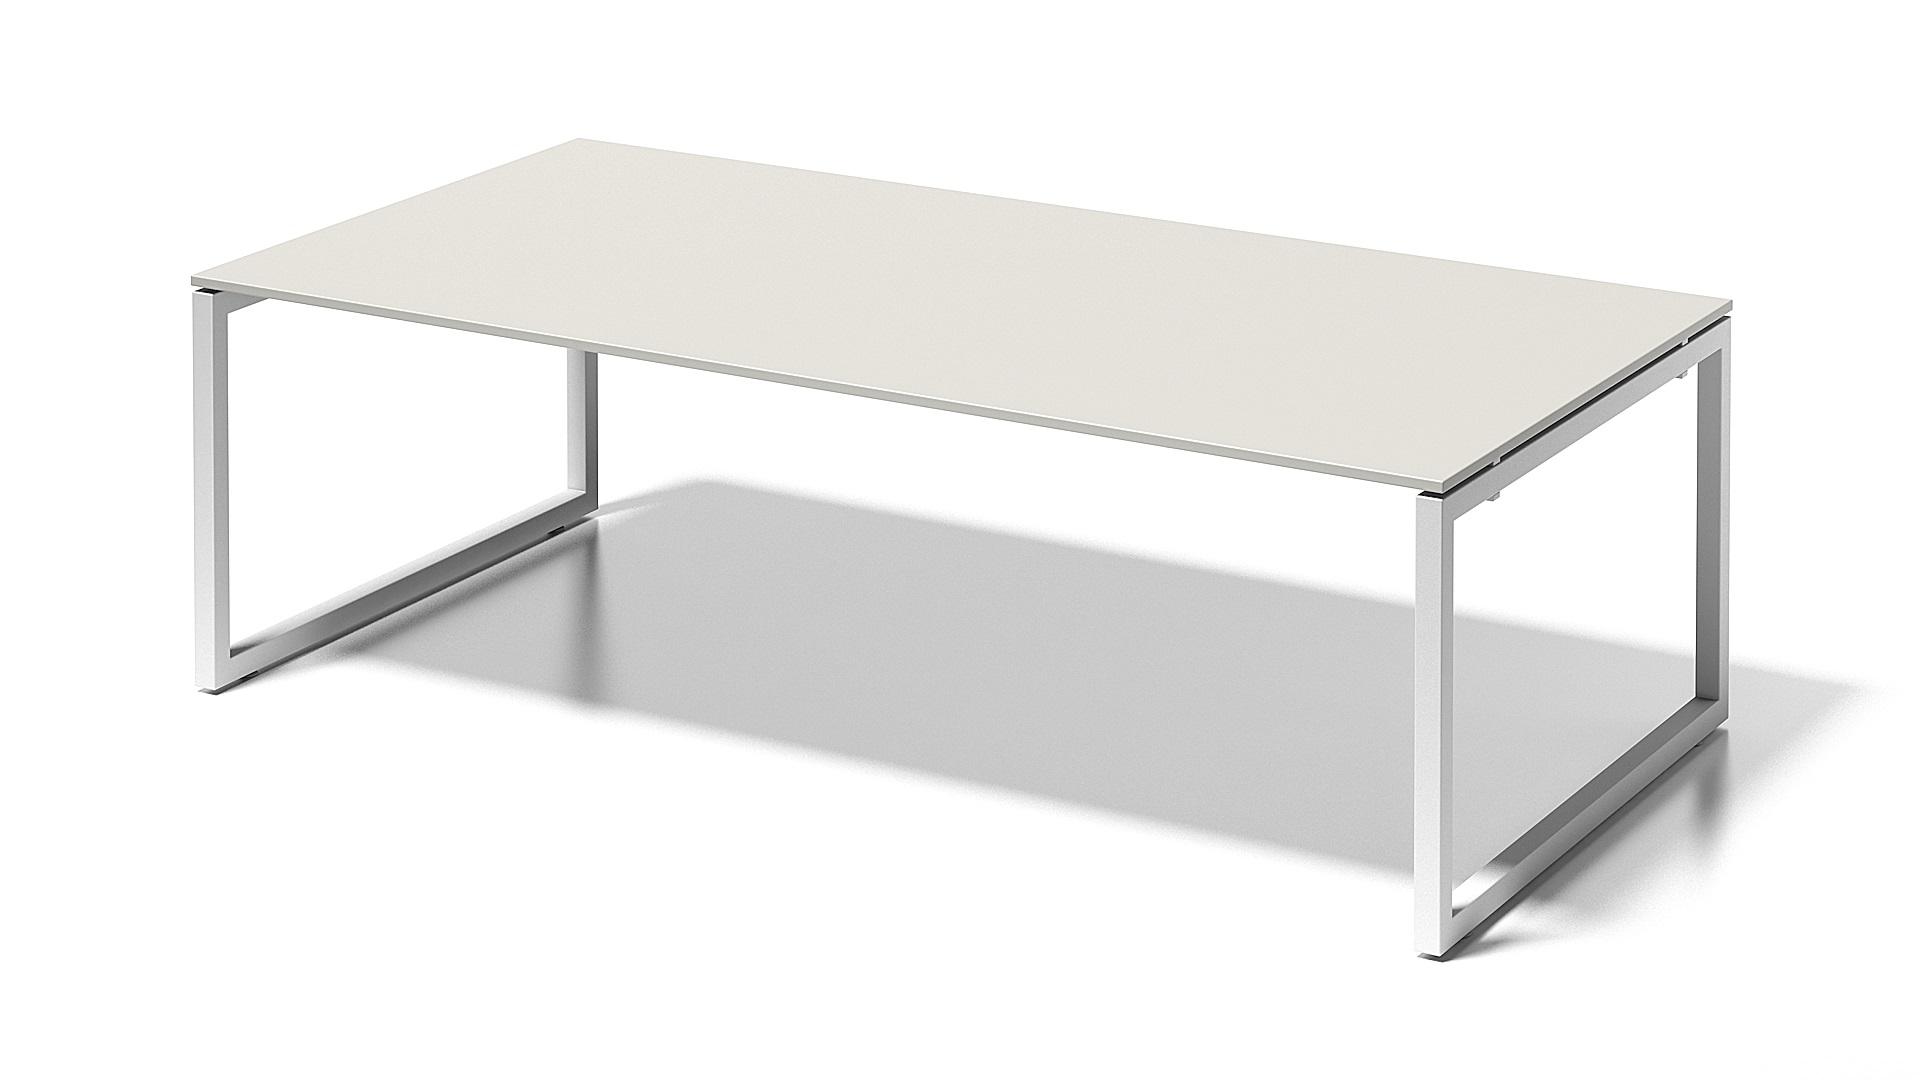 bisley online dof2412 bisley cito schreibtisch. Black Bedroom Furniture Sets. Home Design Ideas